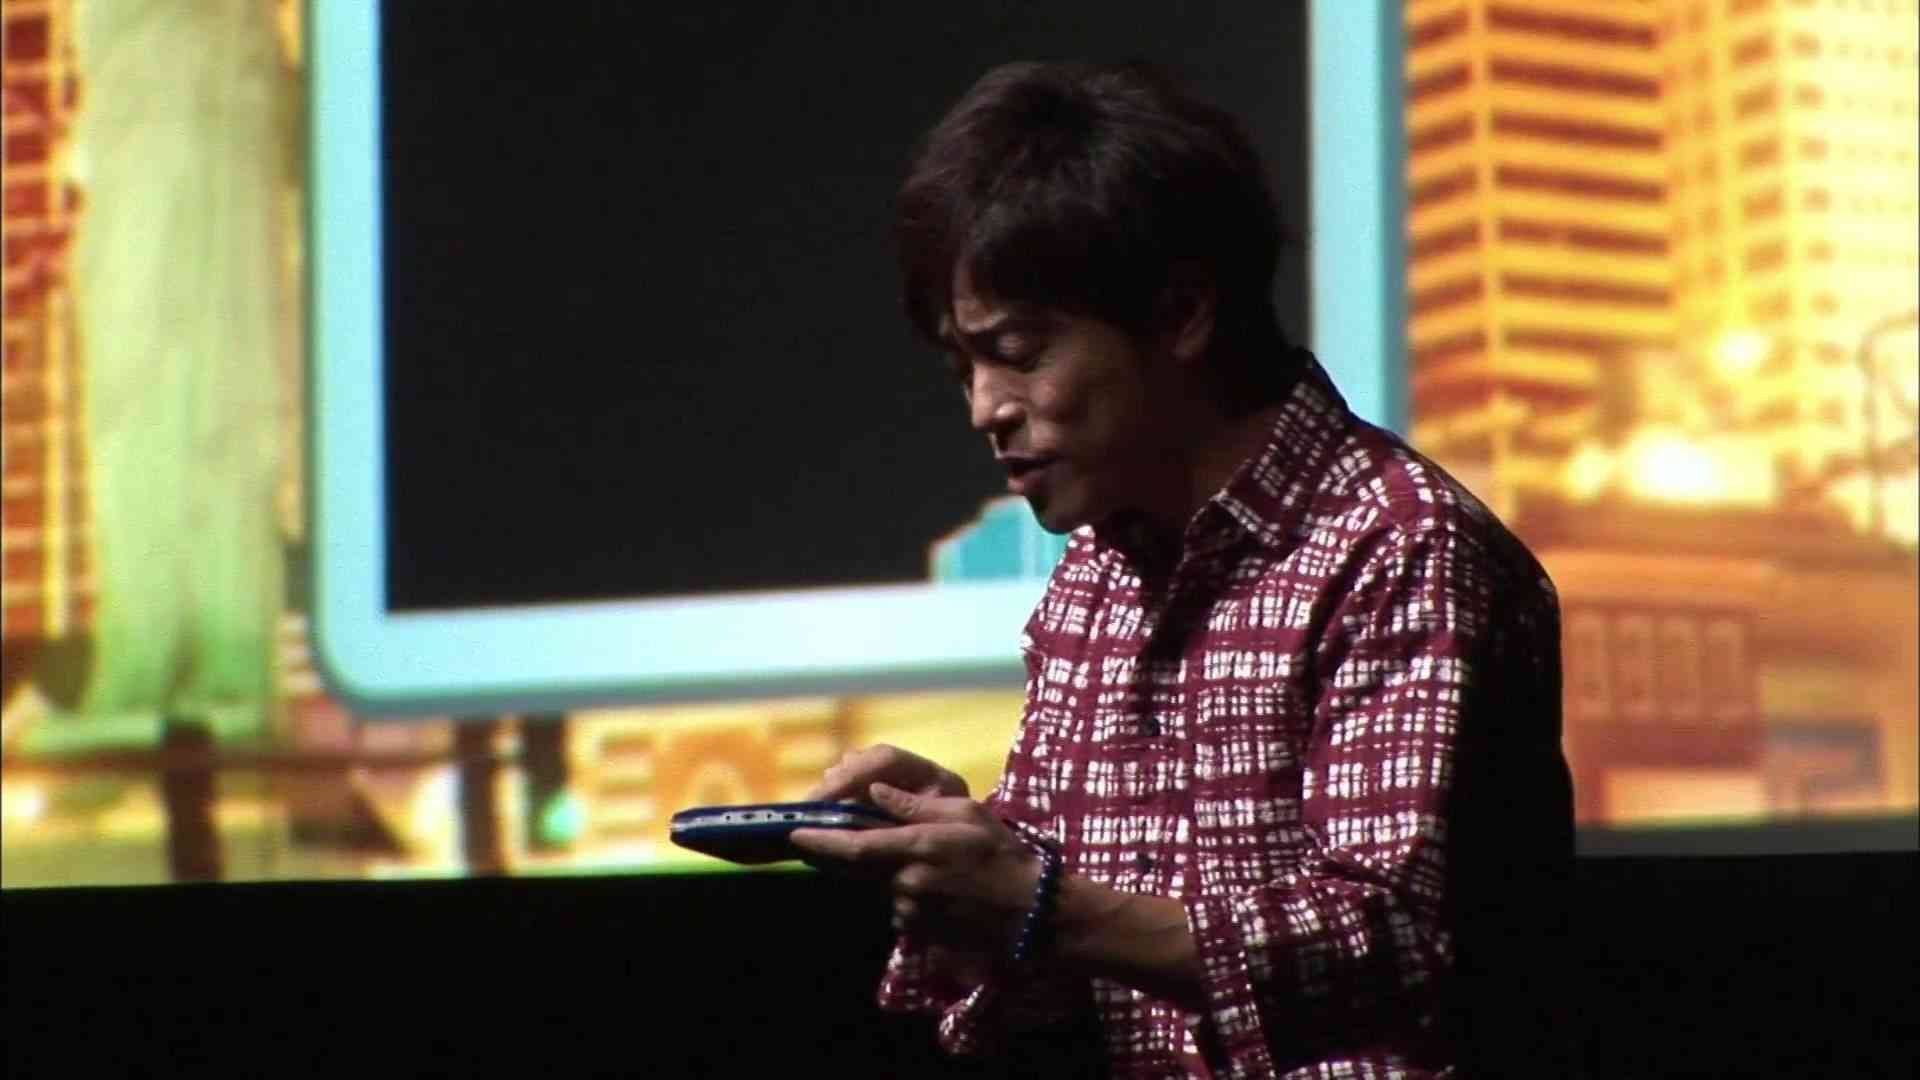 Tomonori Jinnai Tetris English ver. - YouTube